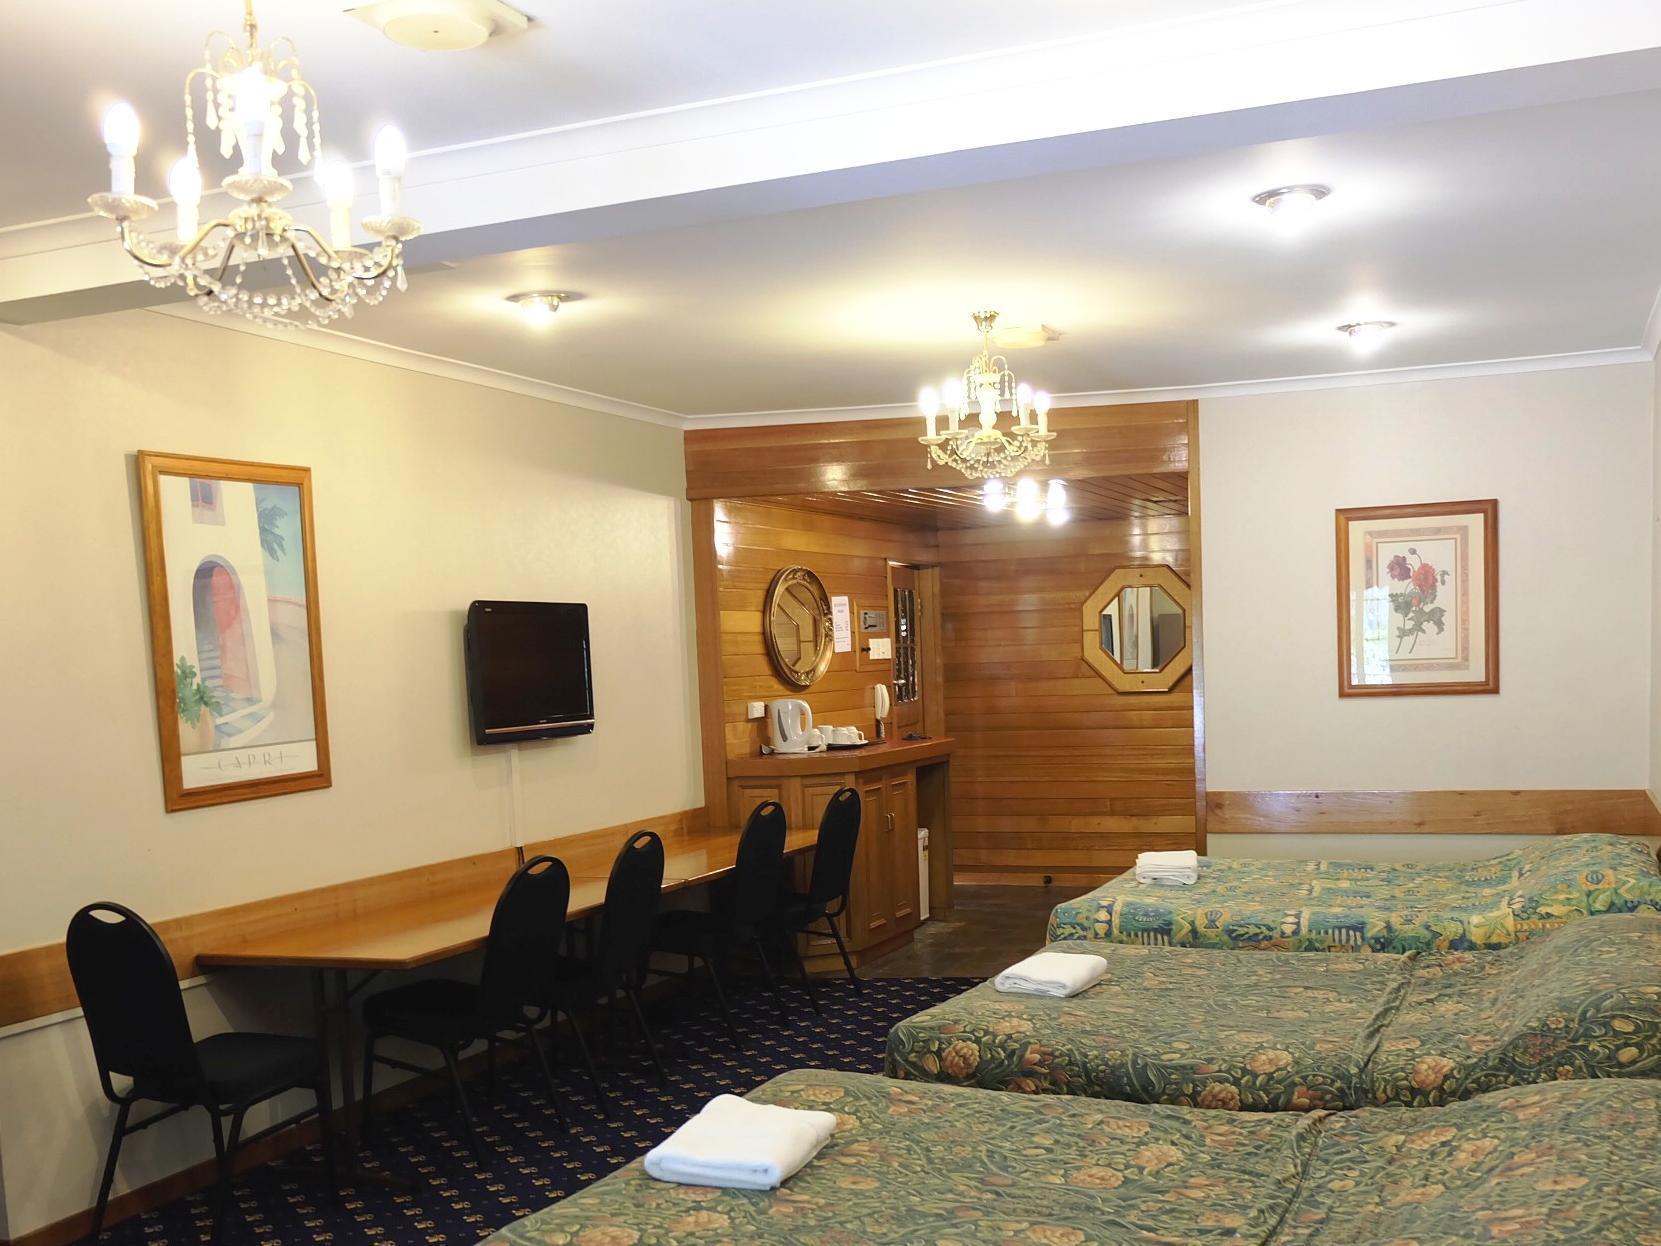 best price on ascot motor inn in sydney reviews. Black Bedroom Furniture Sets. Home Design Ideas